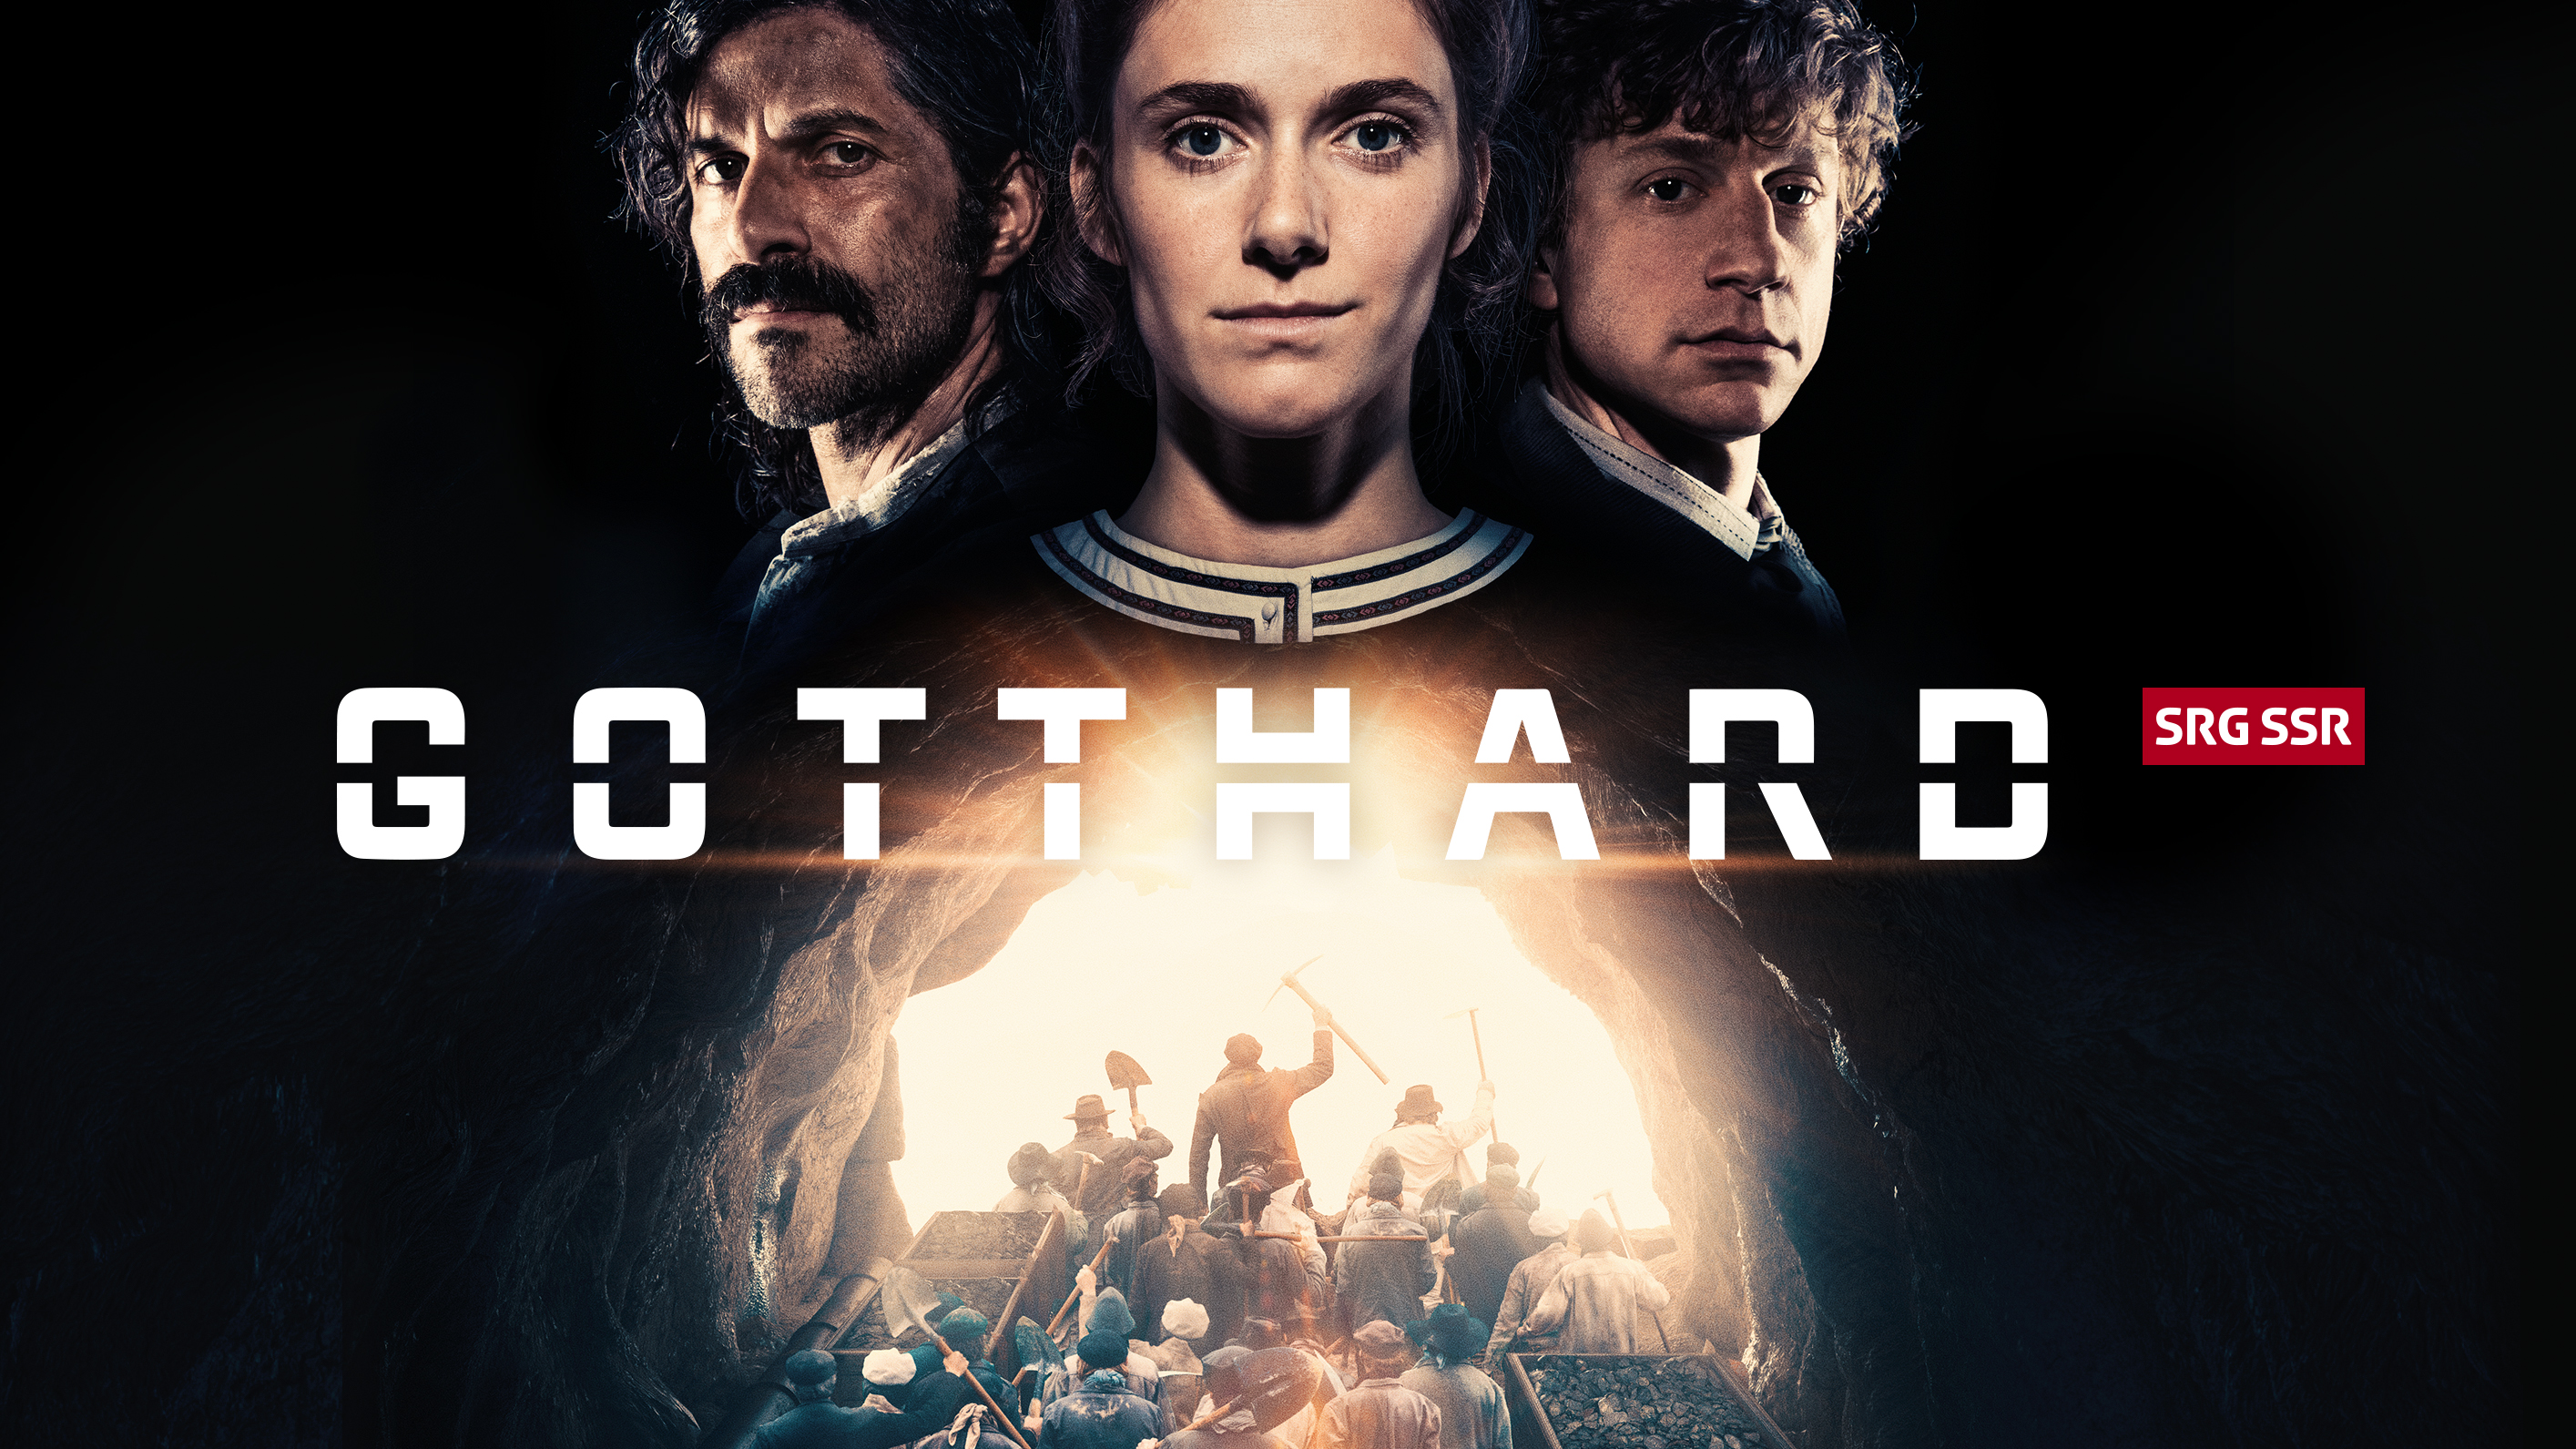 Gotthard Film